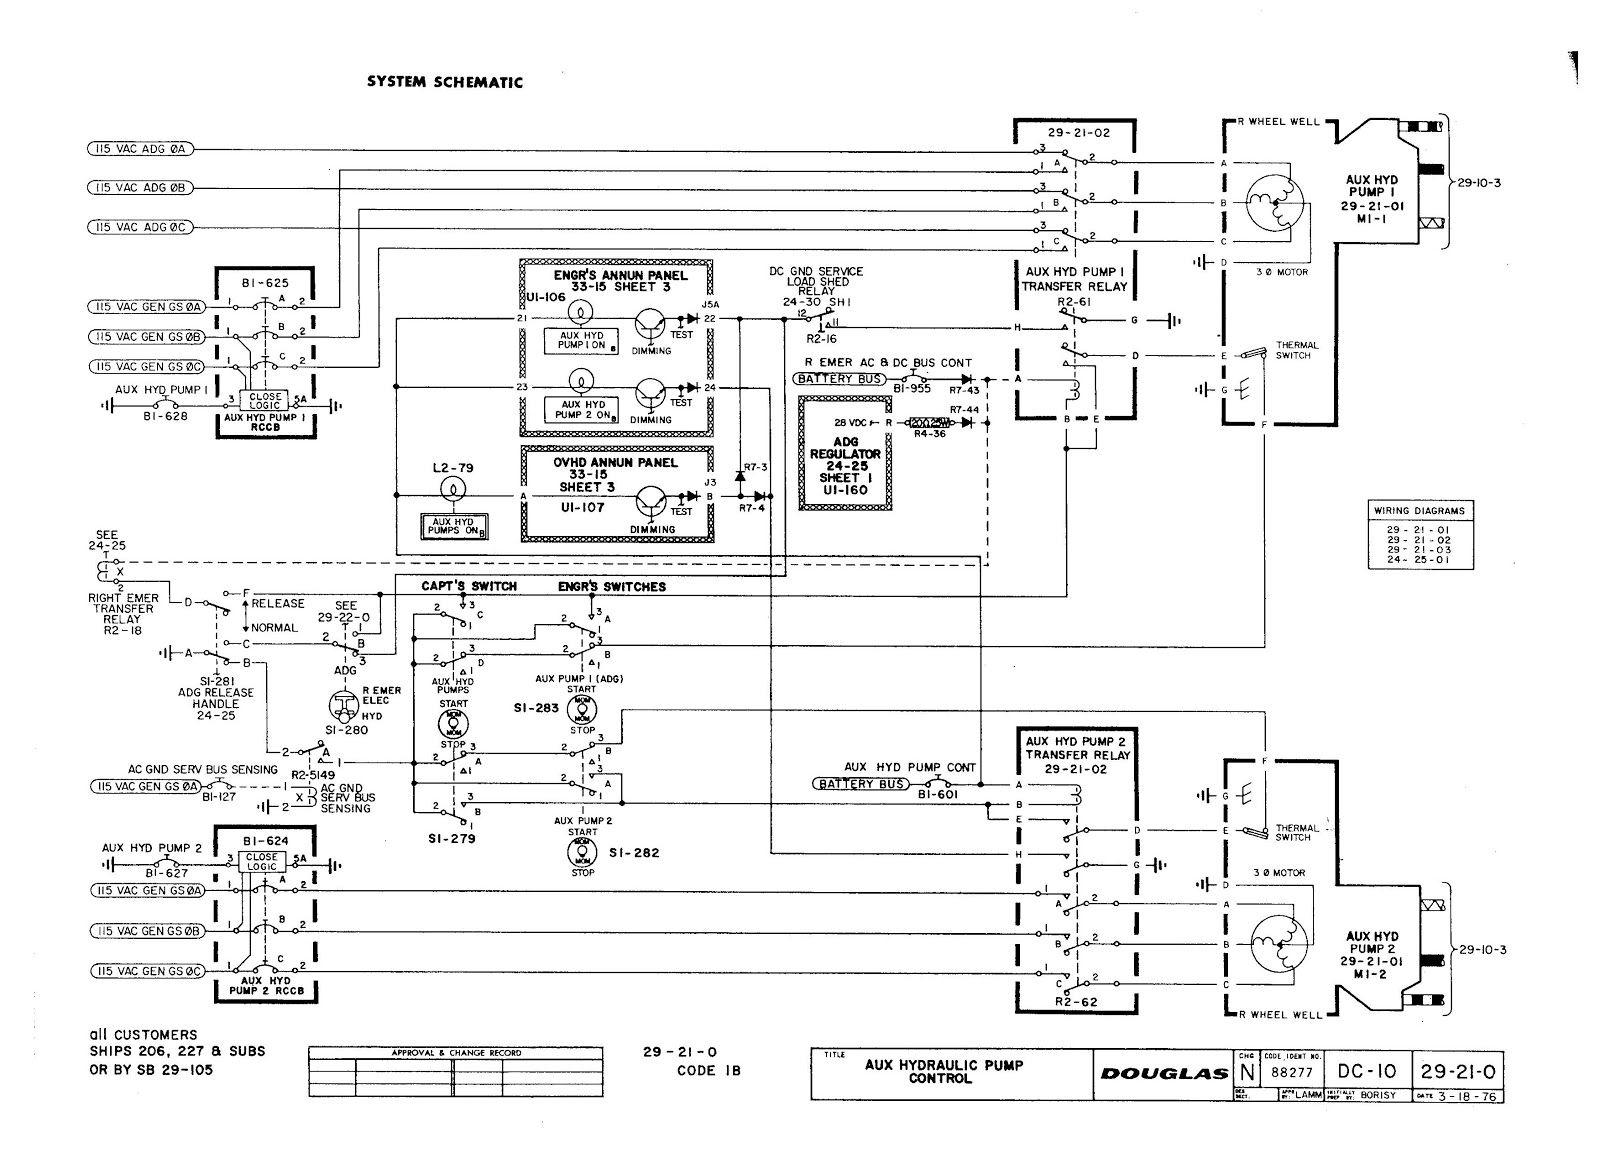 24 Innovative Way To Read Electrical Circuit Diagram Ideas ,  https://bacamajalah.com/24-innovativ…   Electrical circuit diagram, Circuit  diagram, Electrical diagramPinterest